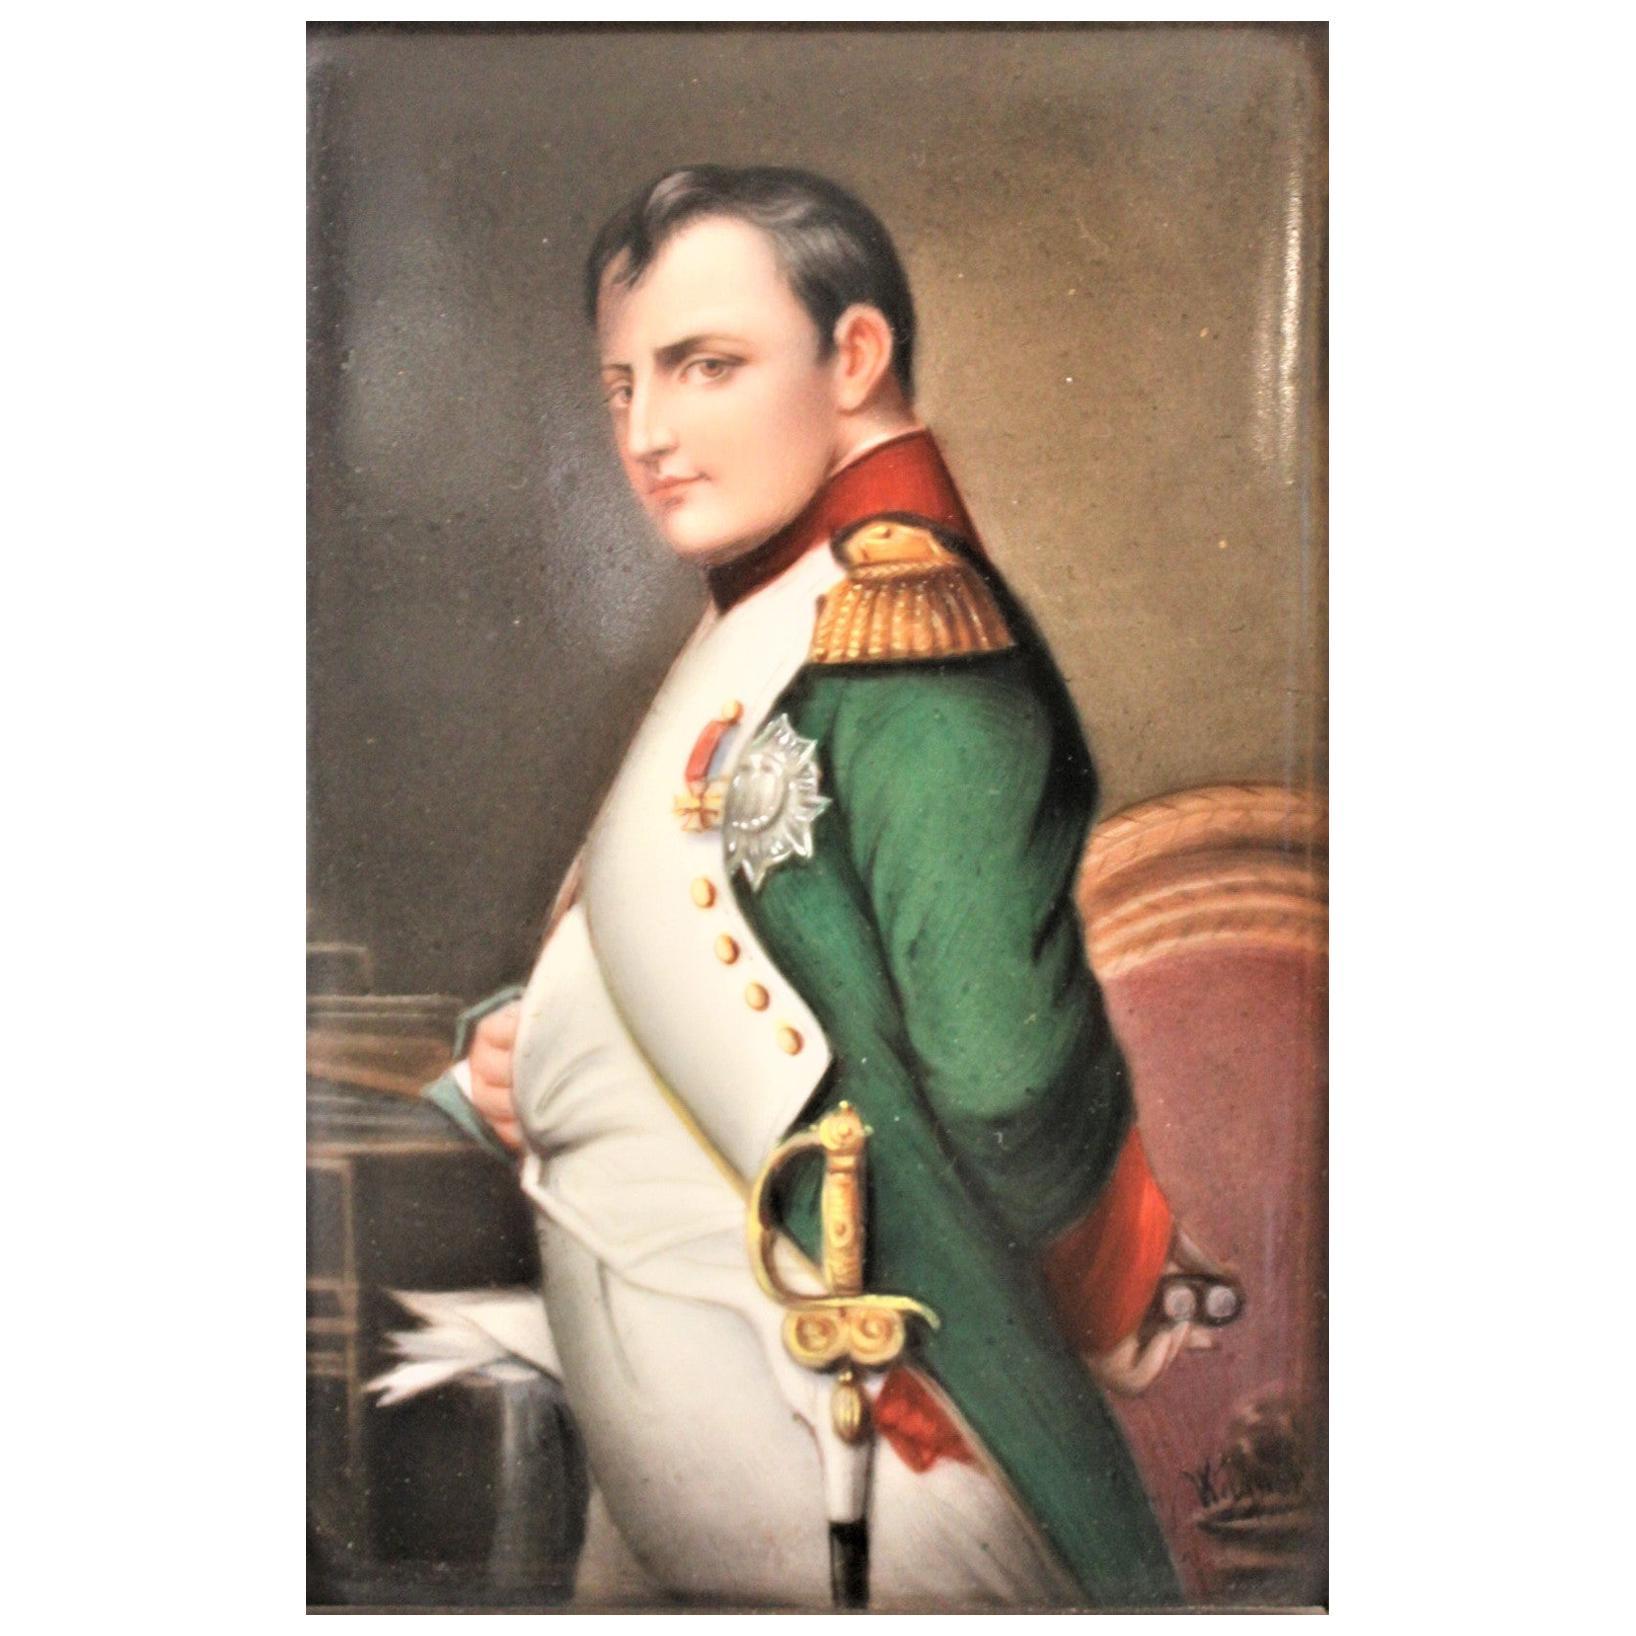 Antique Hand-Painted Porcelain Framed Plaque or Panel of Napoleon Bonaparte